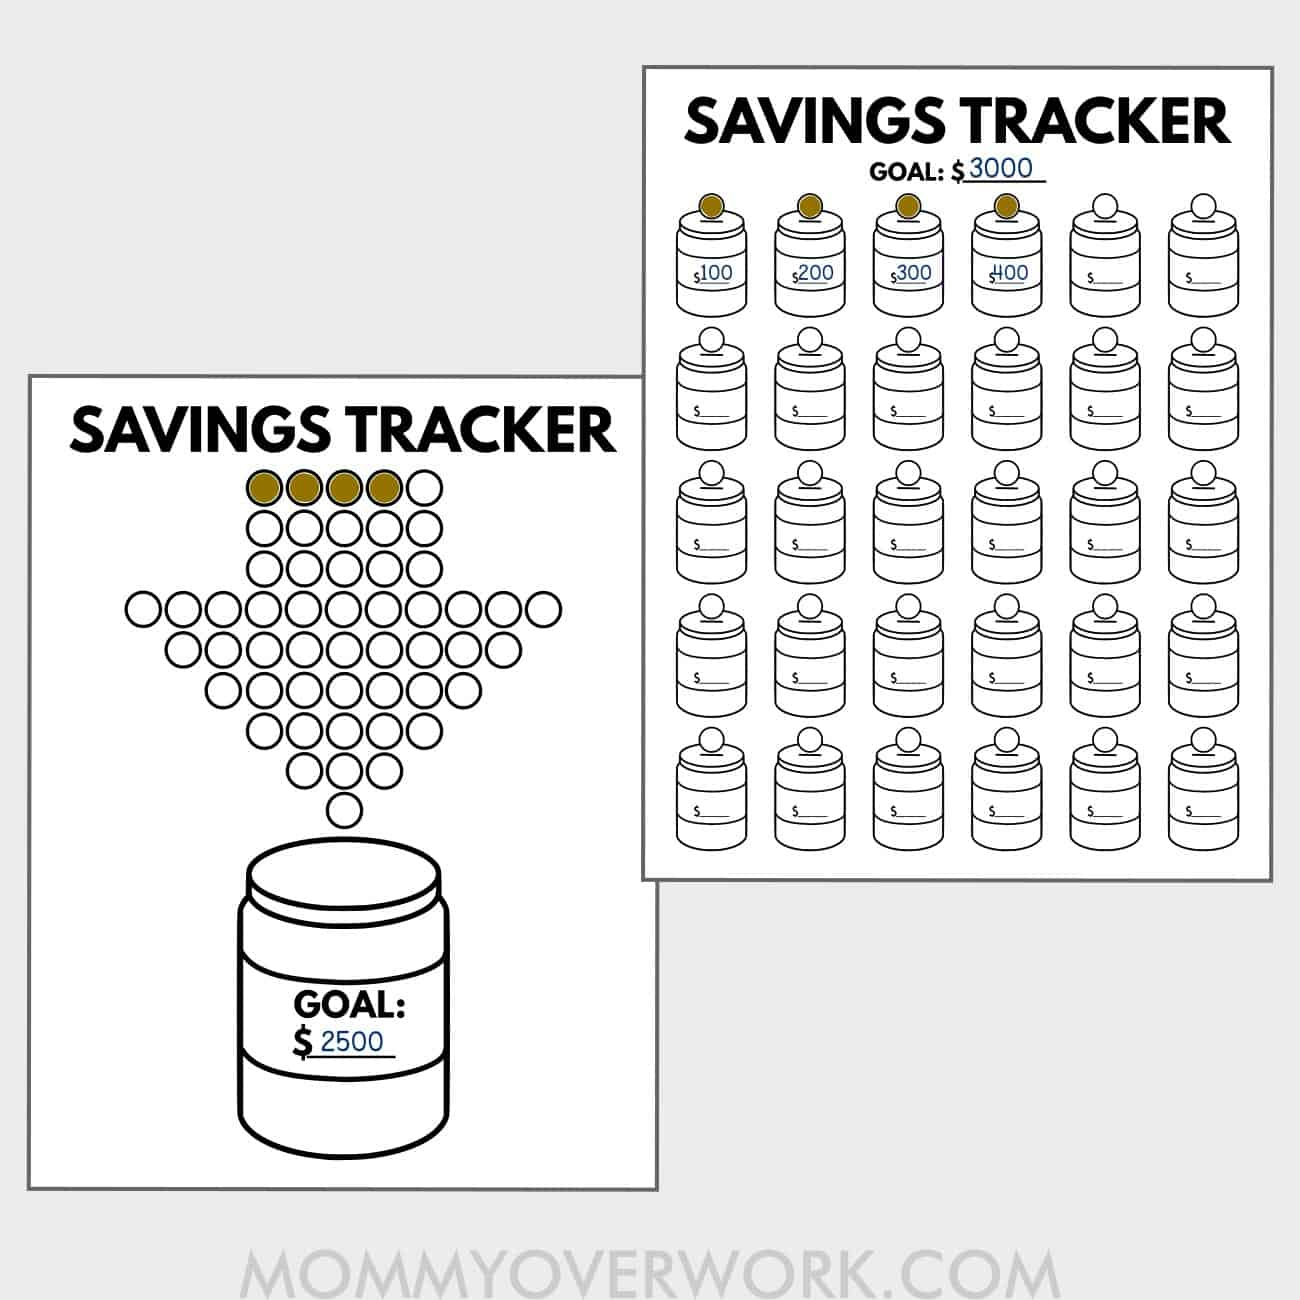 preview of free savings jar printables - arrow of coins dropping into mason jar and chart of 30 mini jars.